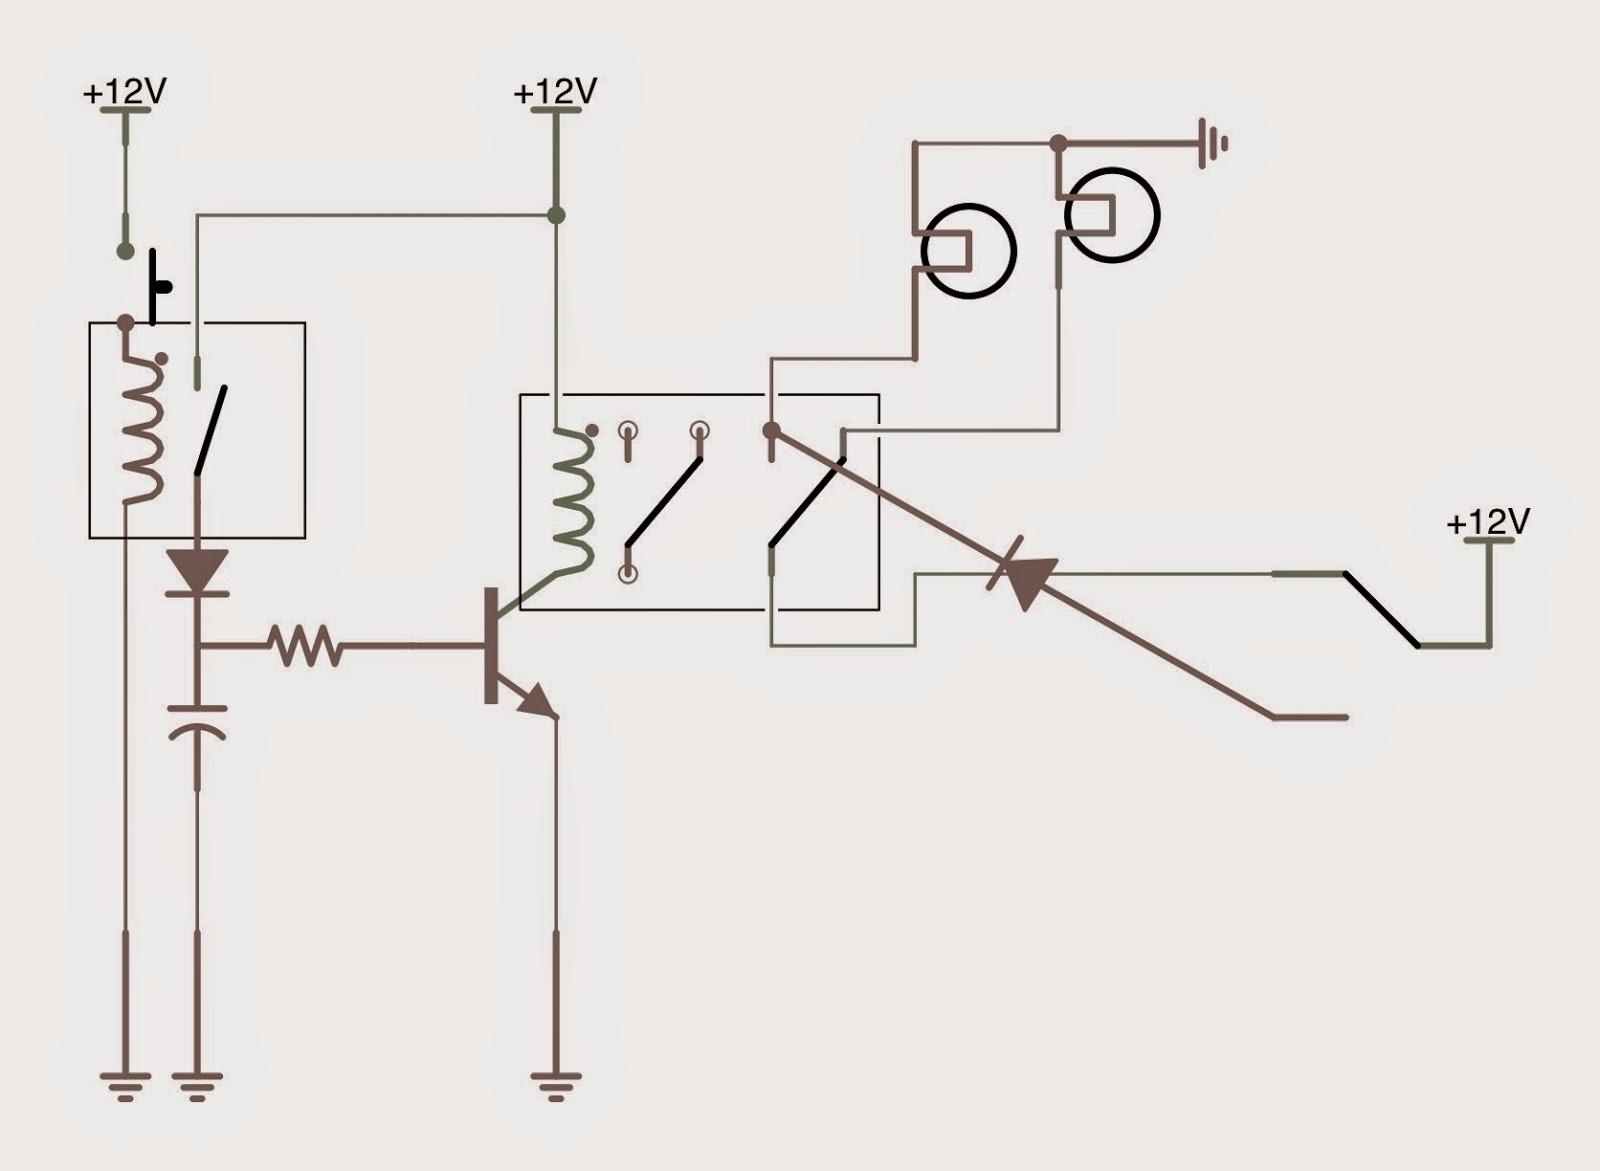 Hornby Dublo 3 Rail Automated Signal Schematics